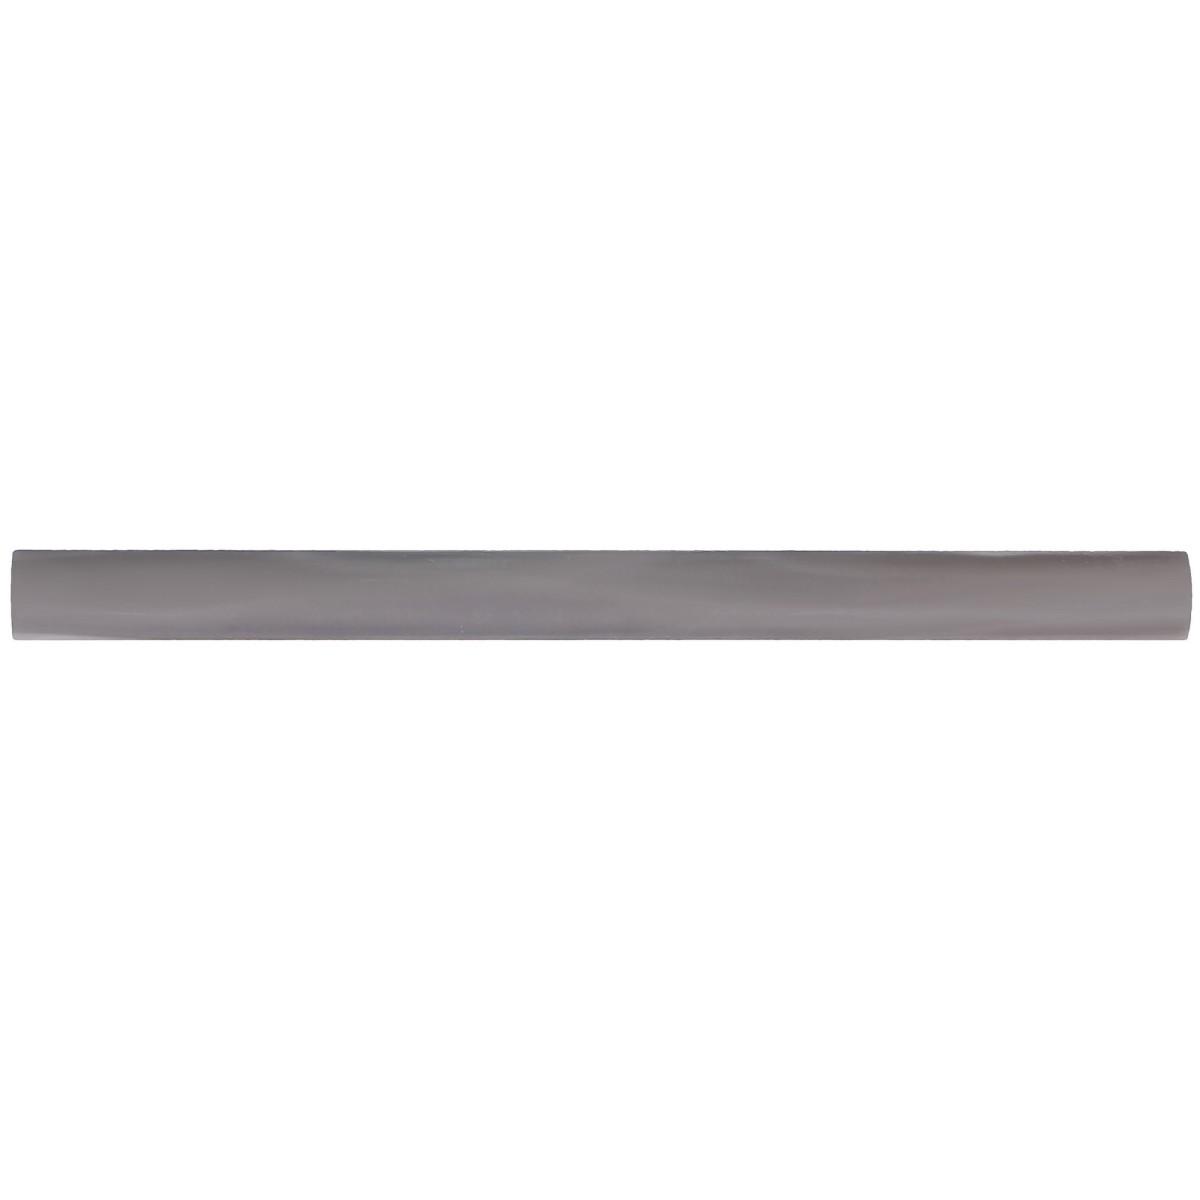 Бордюр-карандаш «Волна» 20х1.5 см цвет коричневый